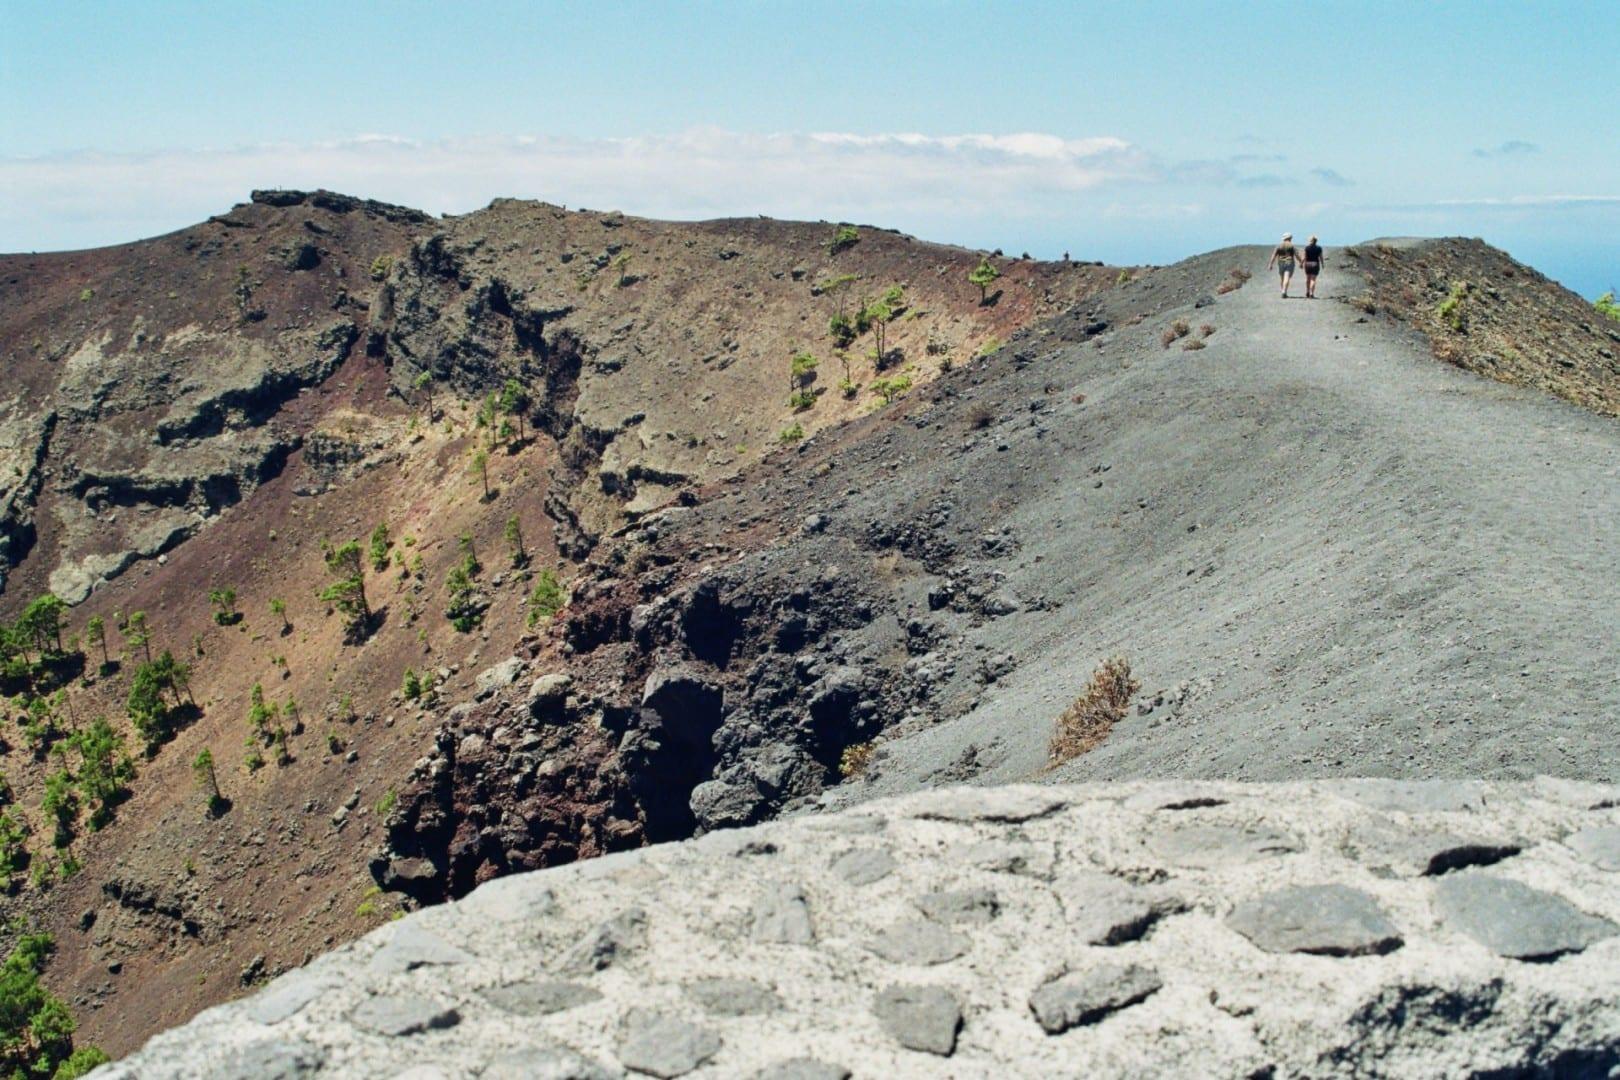 Volcano San Antonio near village Fuencaliente La Palma España